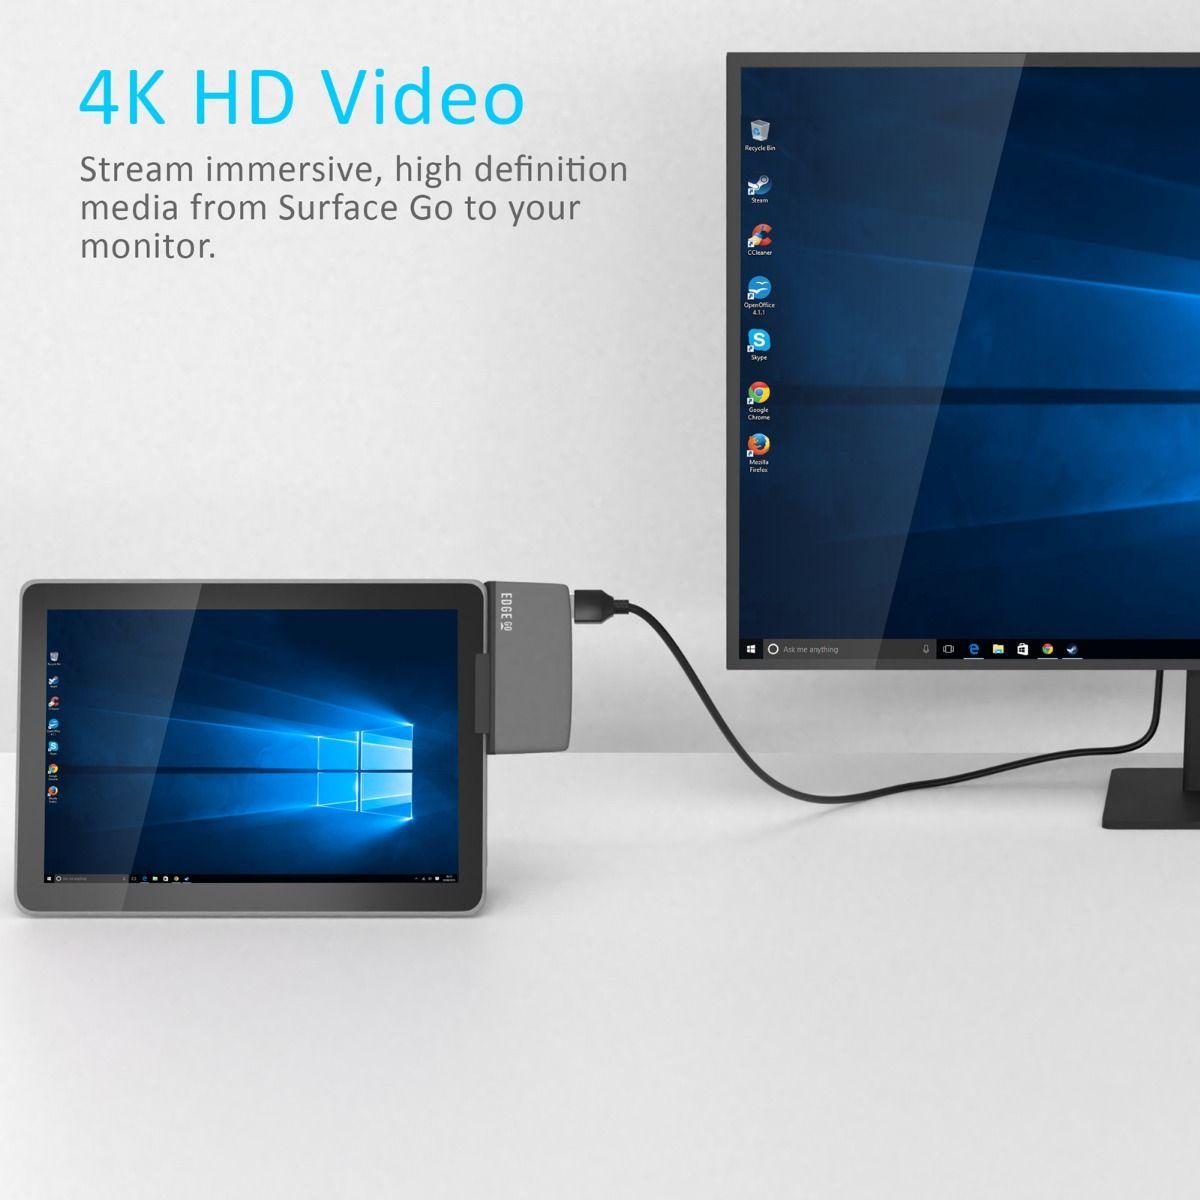 Edge Go Multifunction USB- C Hub for Microsoft Surface Go Tablet